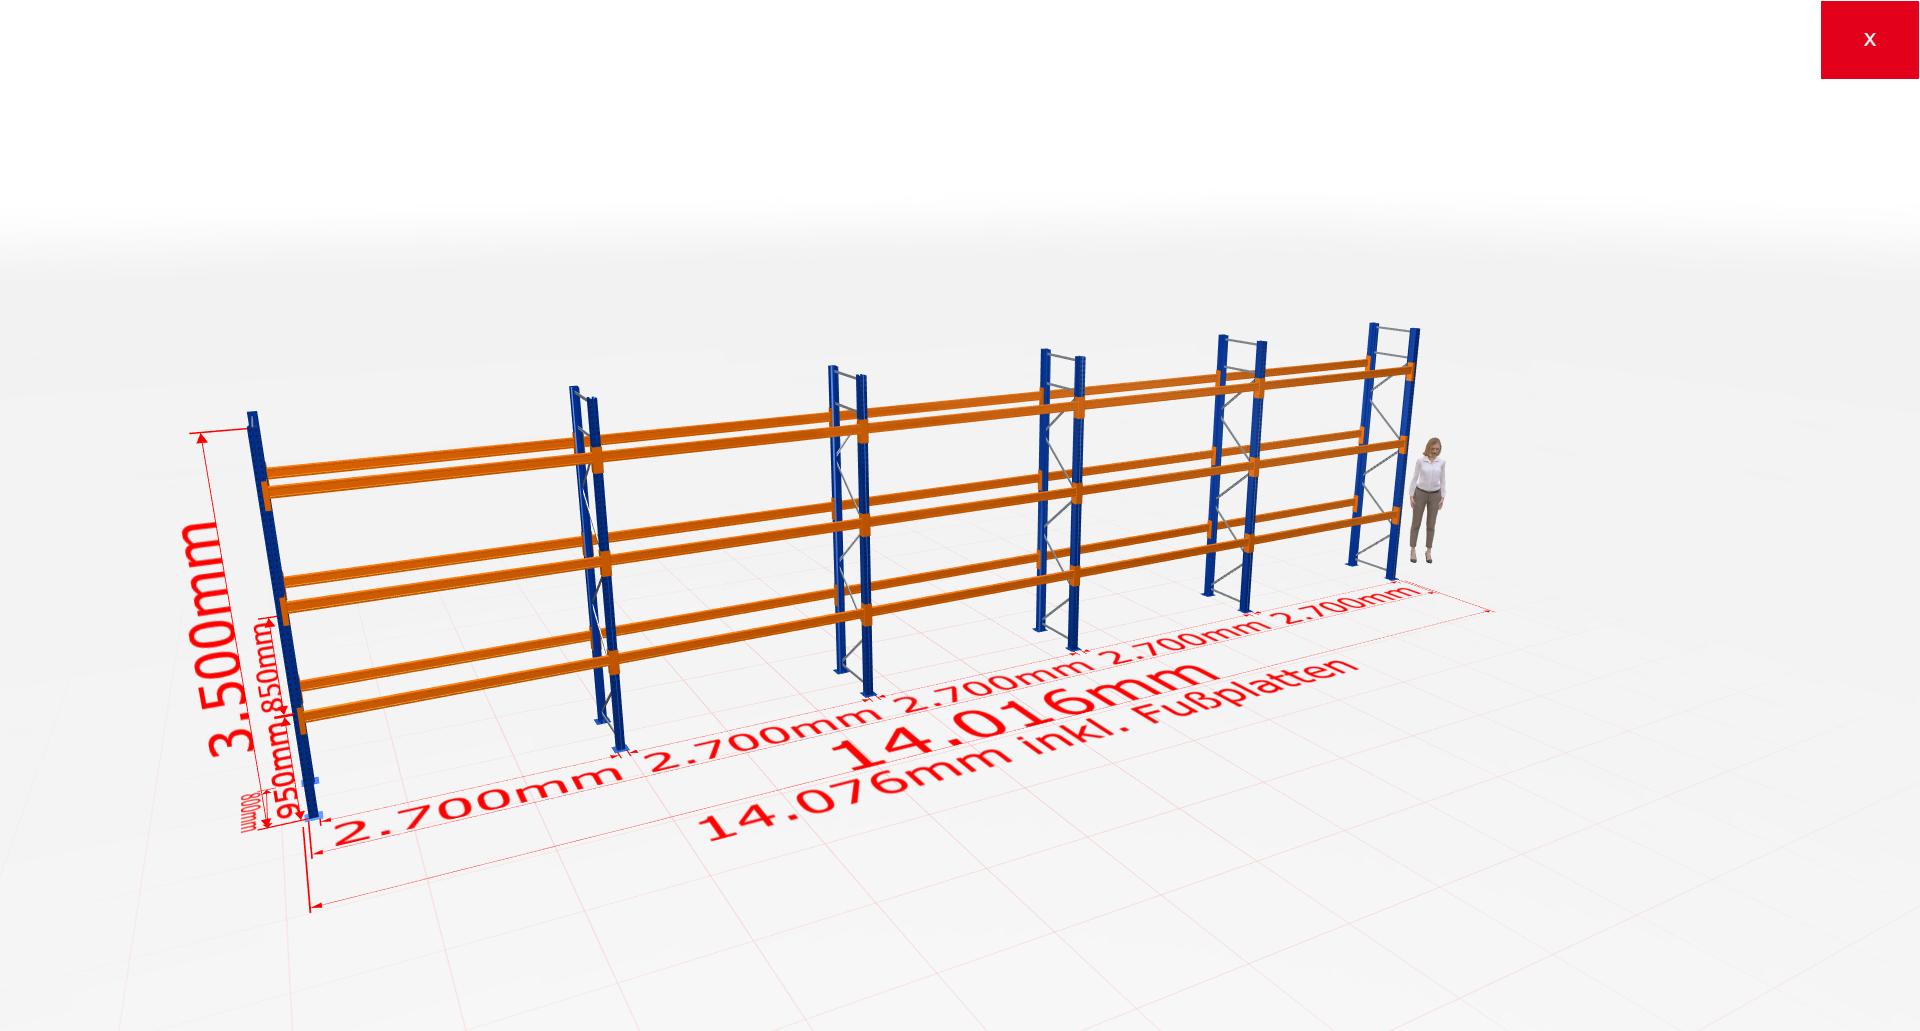 Palettenregal Komplettregal 3500x14016x800 mm (HxBxT) 3 Fachebenen SCHULTE Lagertechnik